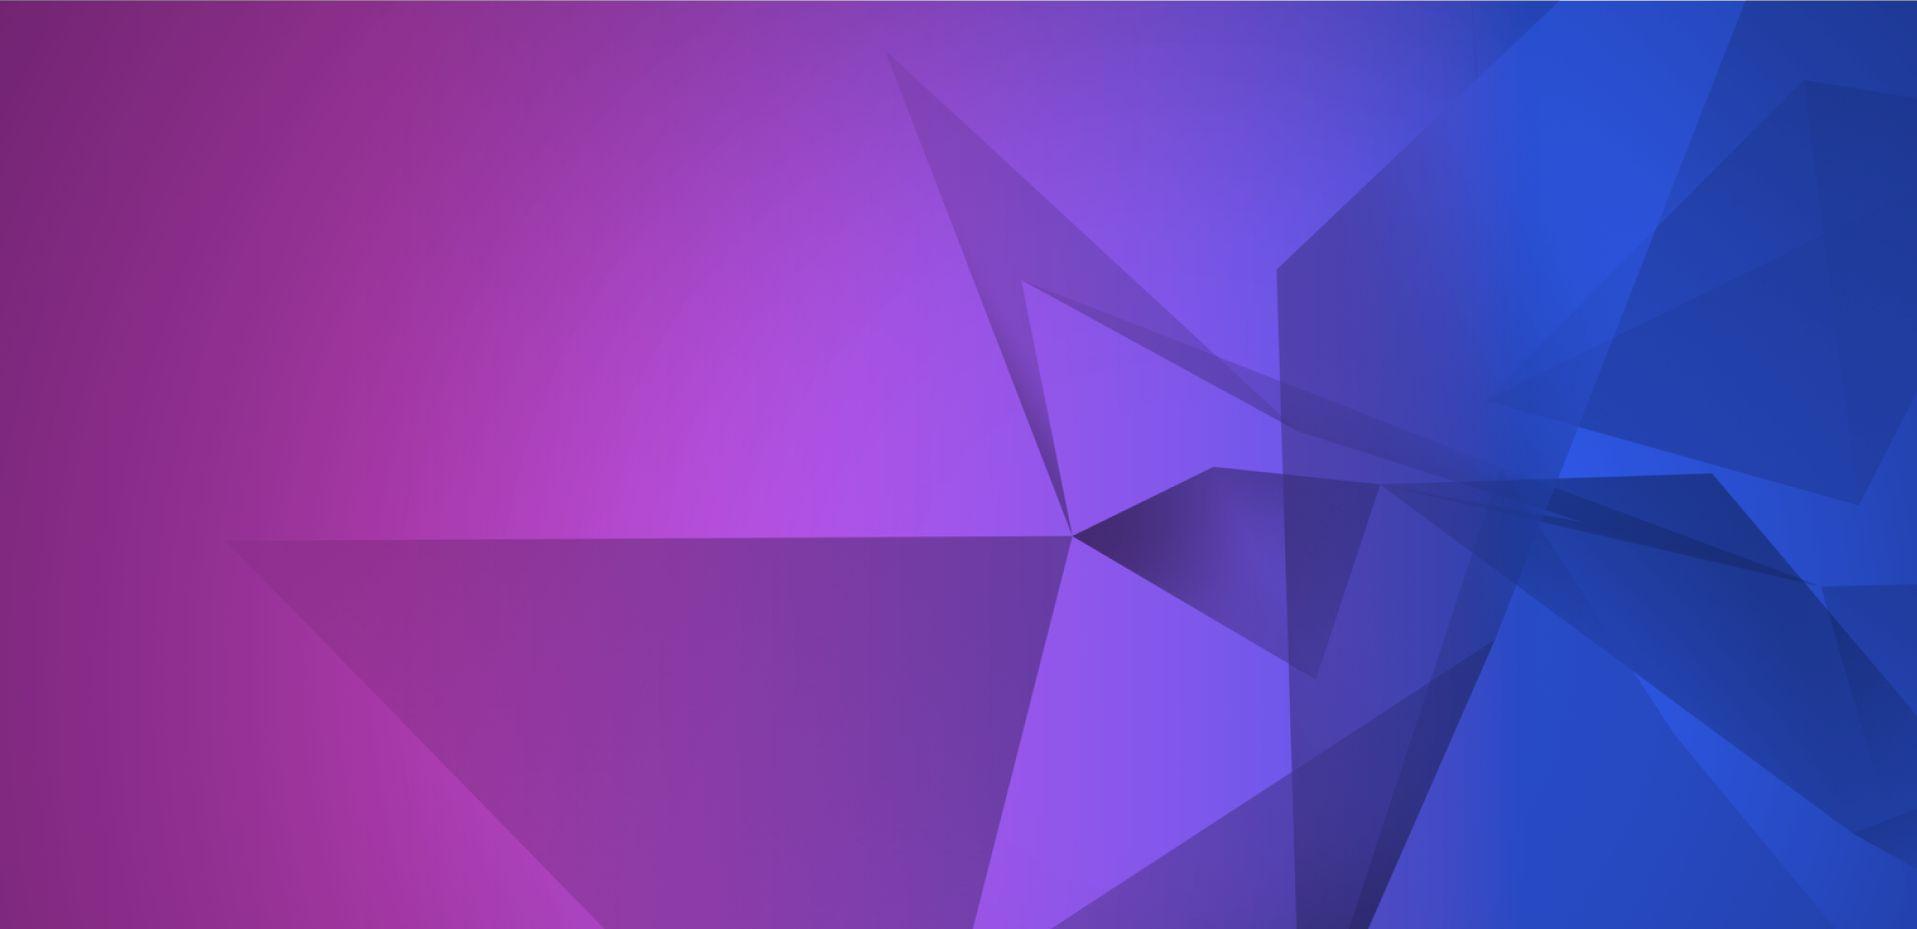 Image boxes - Code Elixir LDN